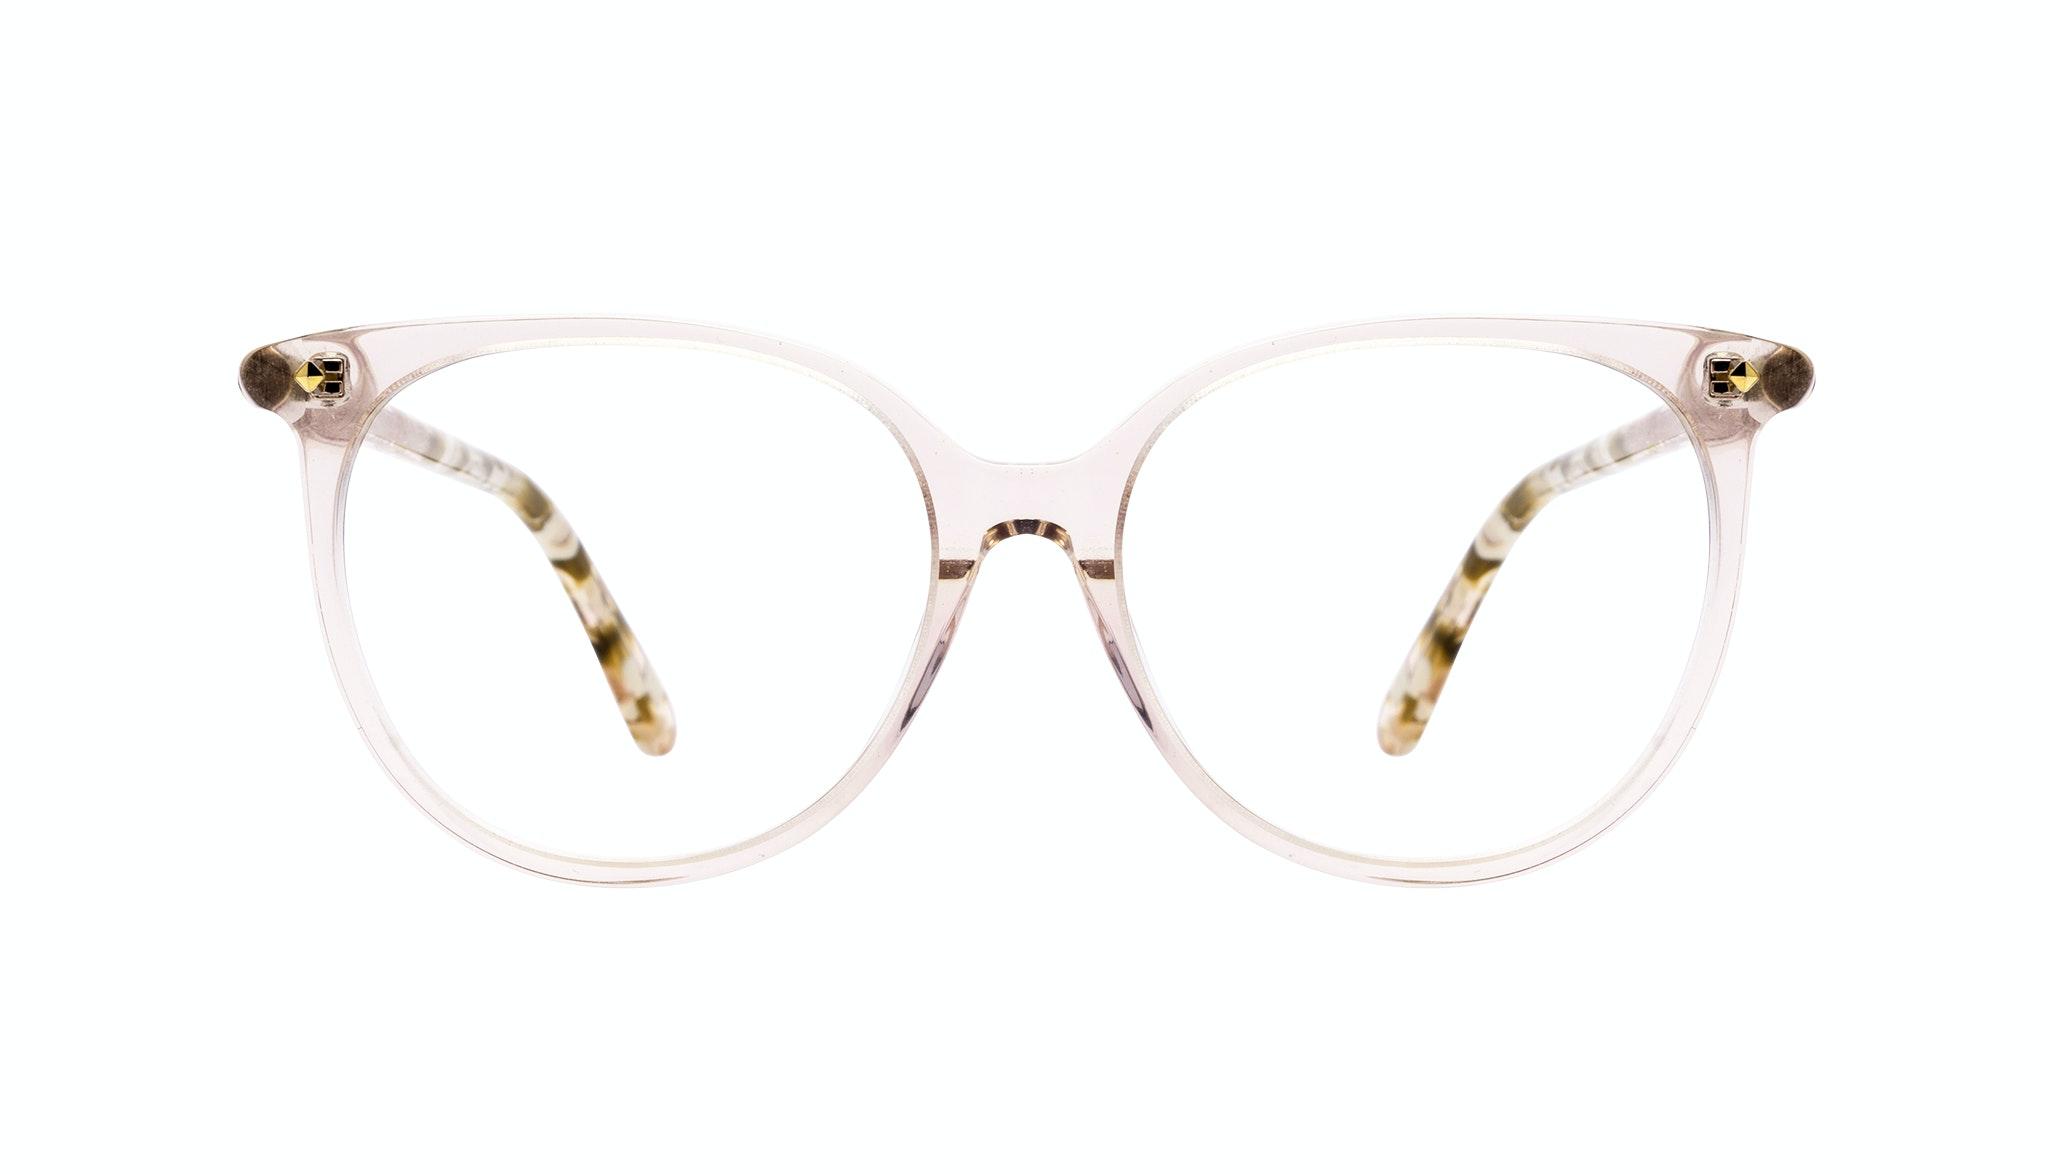 Affordable Fashion Glasses Round Eyeglasses Women Area Petite Rose Front